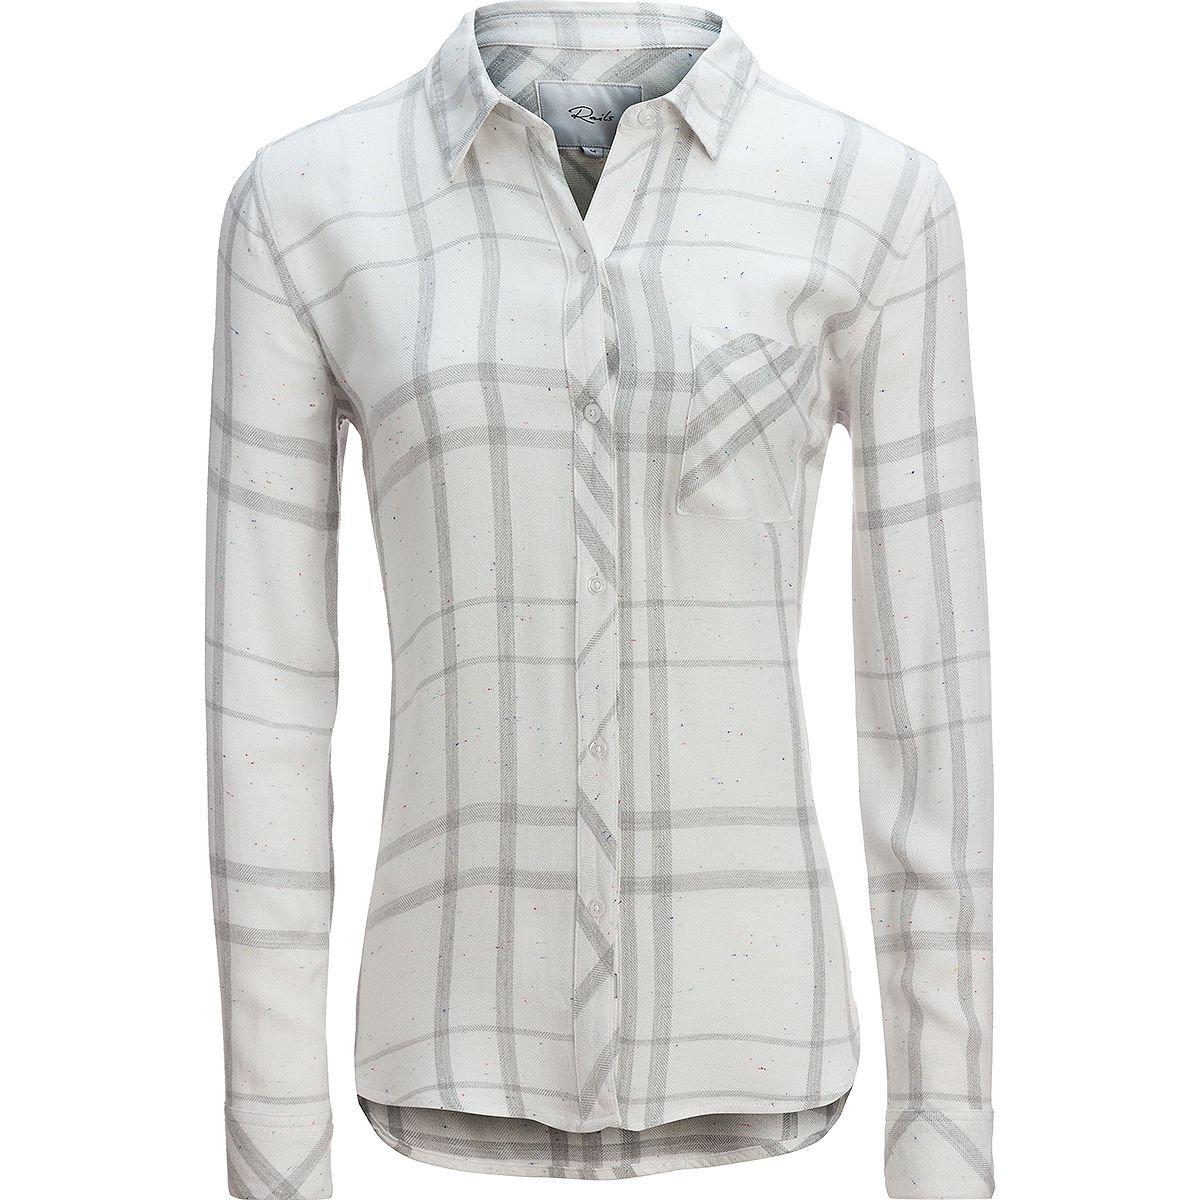 Rails Hunter White/Charcoal/Funfetti Long-Sleeve Button Up - Women's White/Charcoal/Funfetti, XS